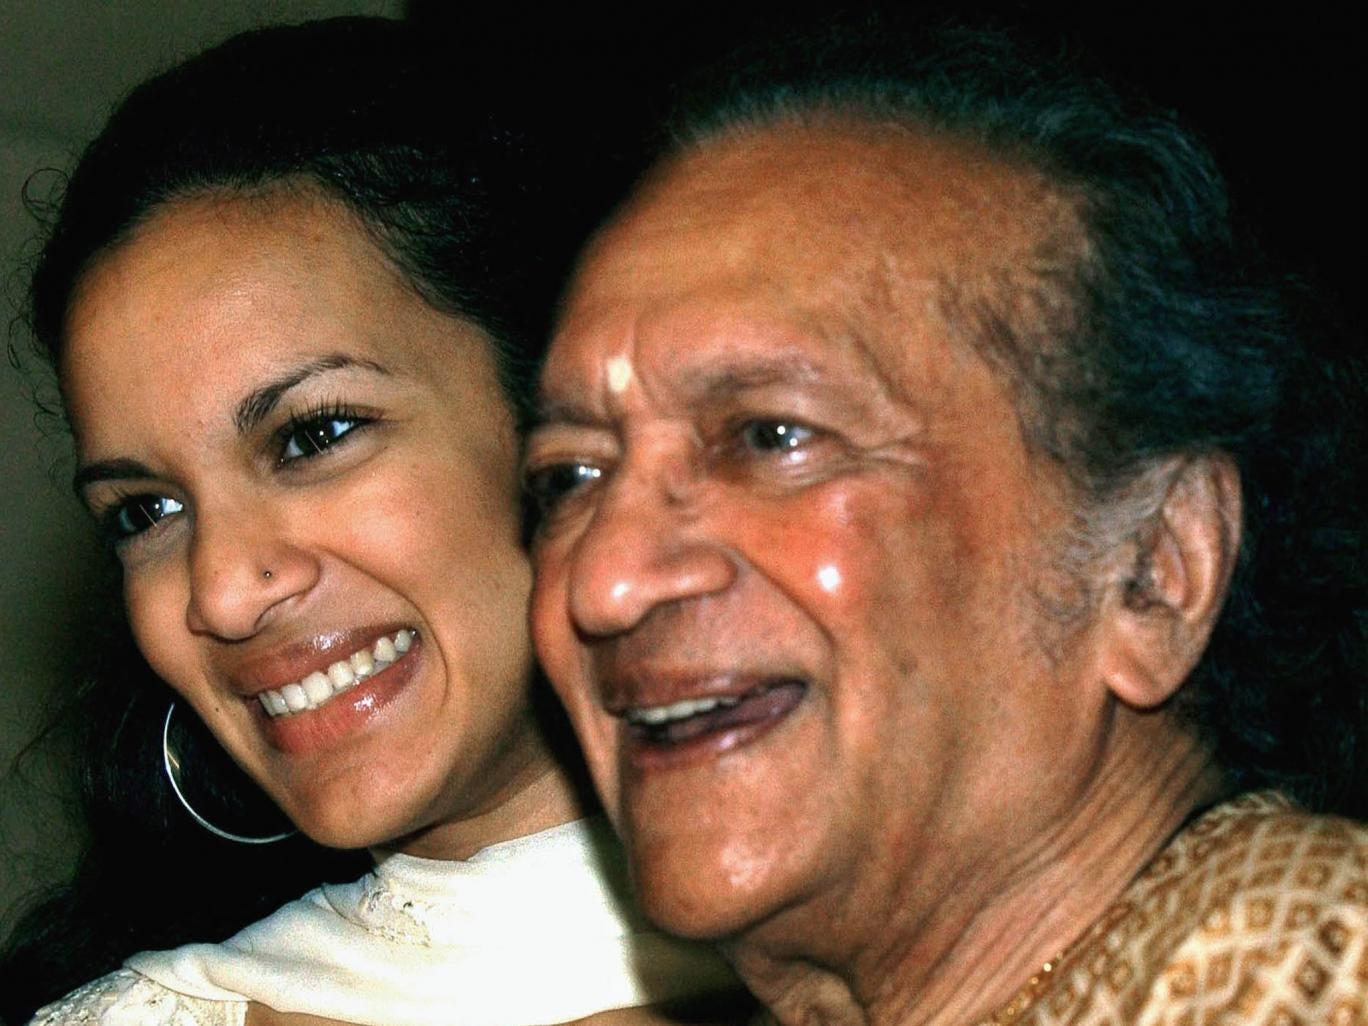 Sitarist and composer Ravi Shankar with daughter Anoushka Shankar